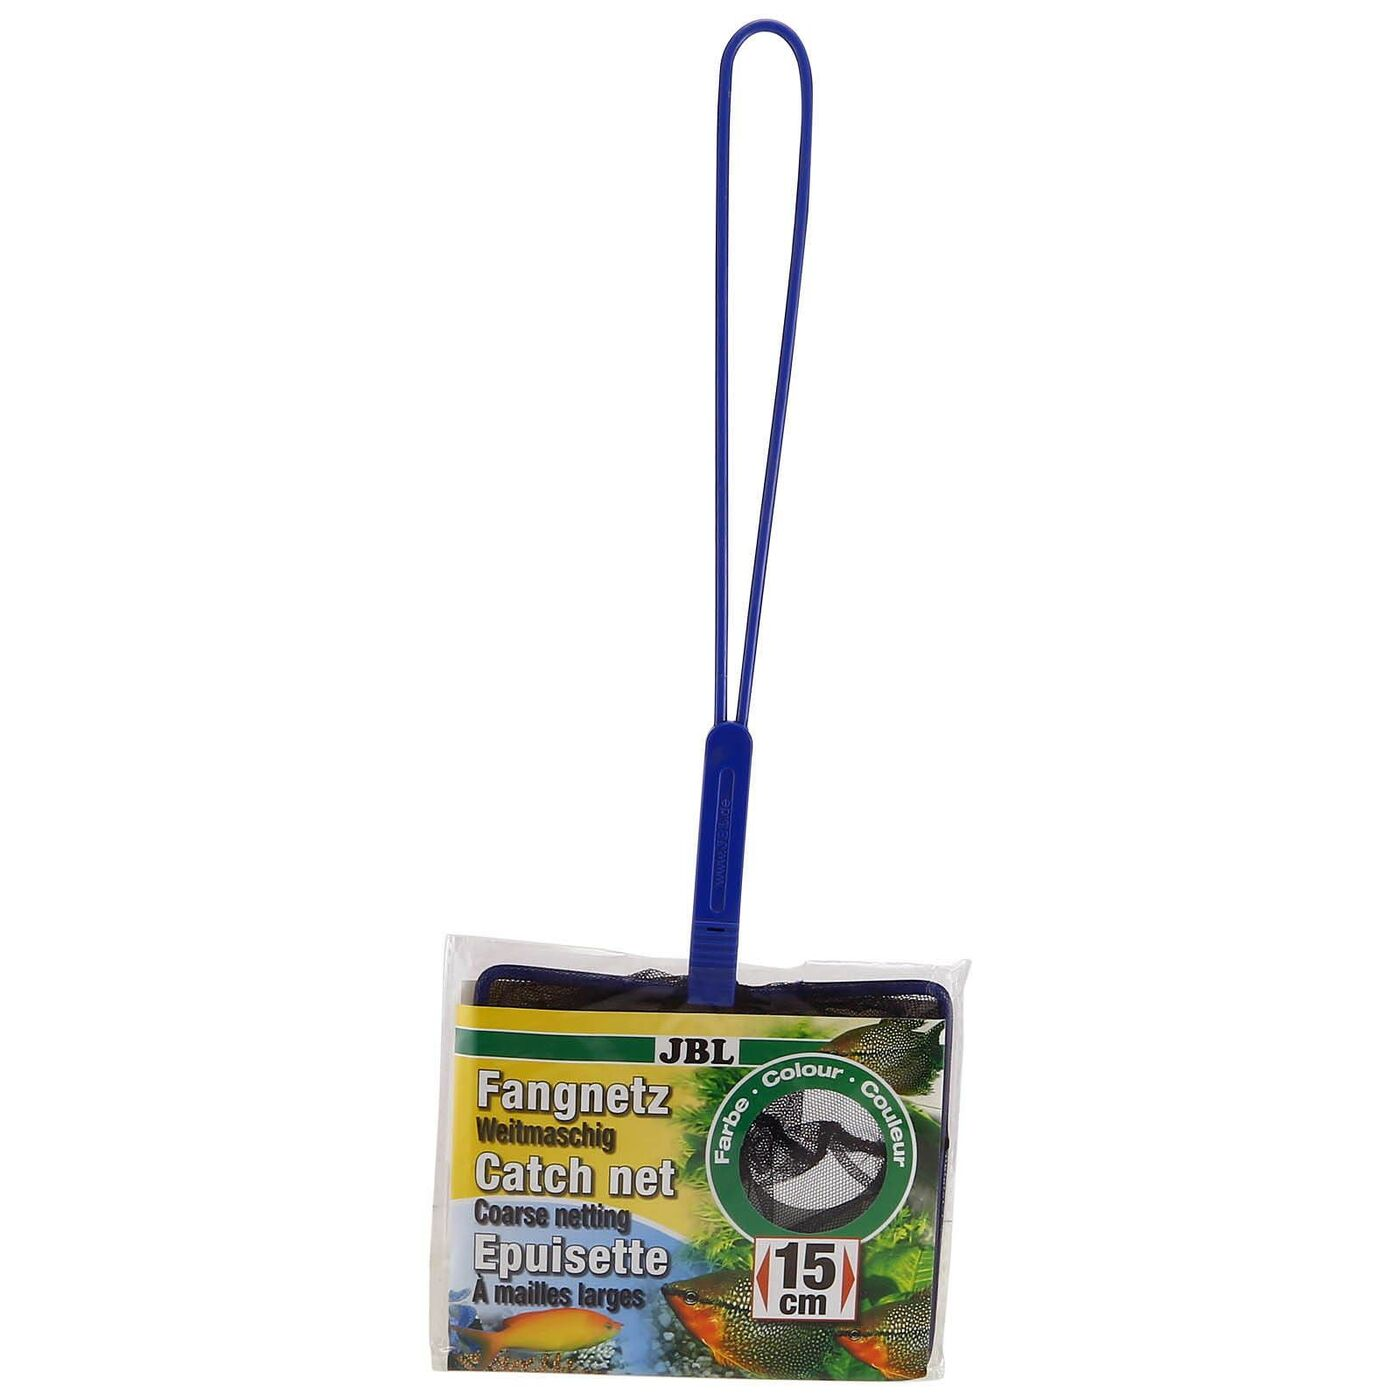 JBL Fish Net PREMIUM coarse - Сачок премиум с крупной сеткой черного цвета, 31х5,5 см